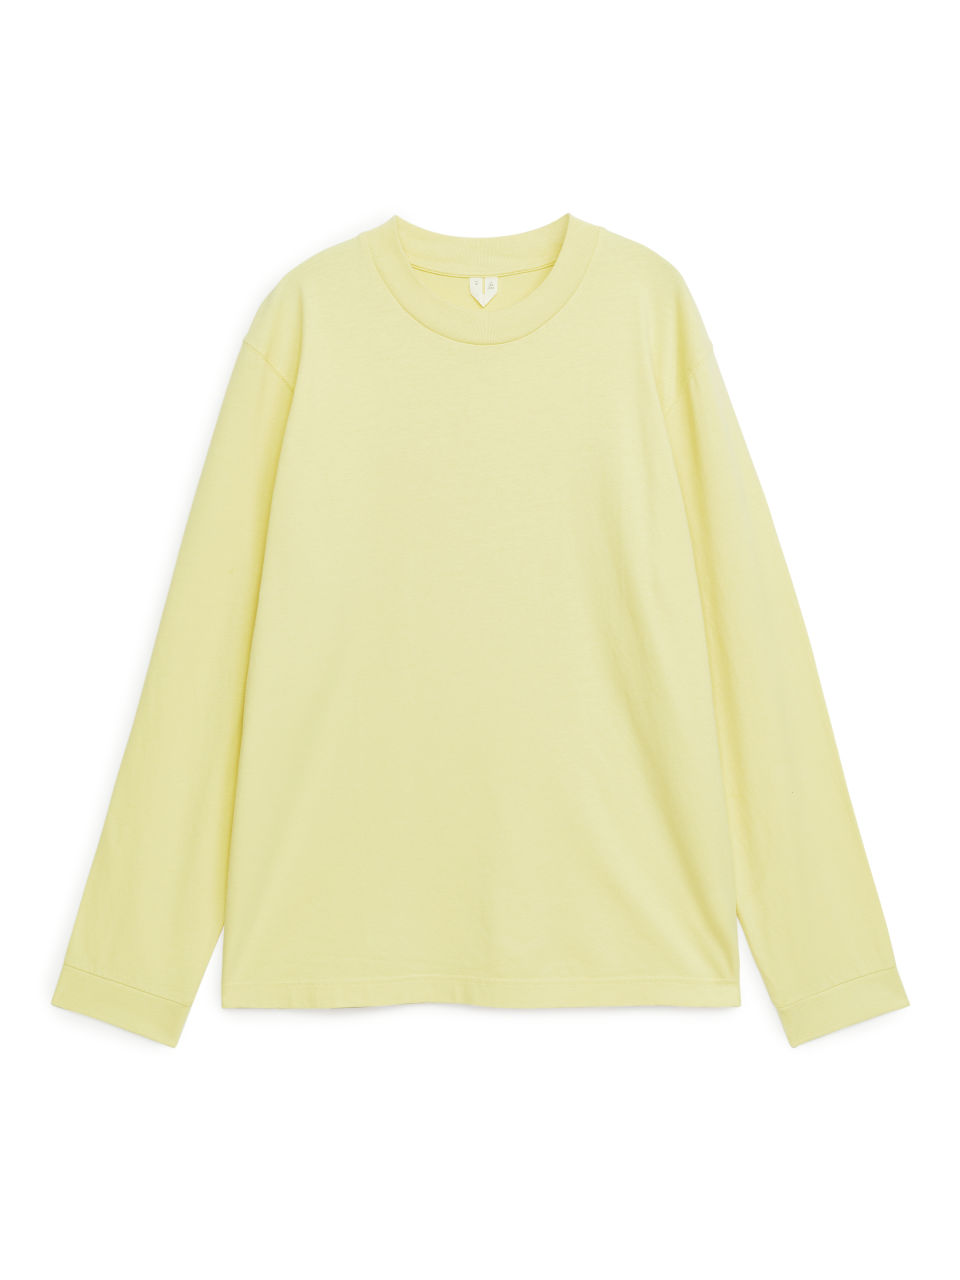 Long-Sleeved Organic Cotton T-Shirt - Yellow